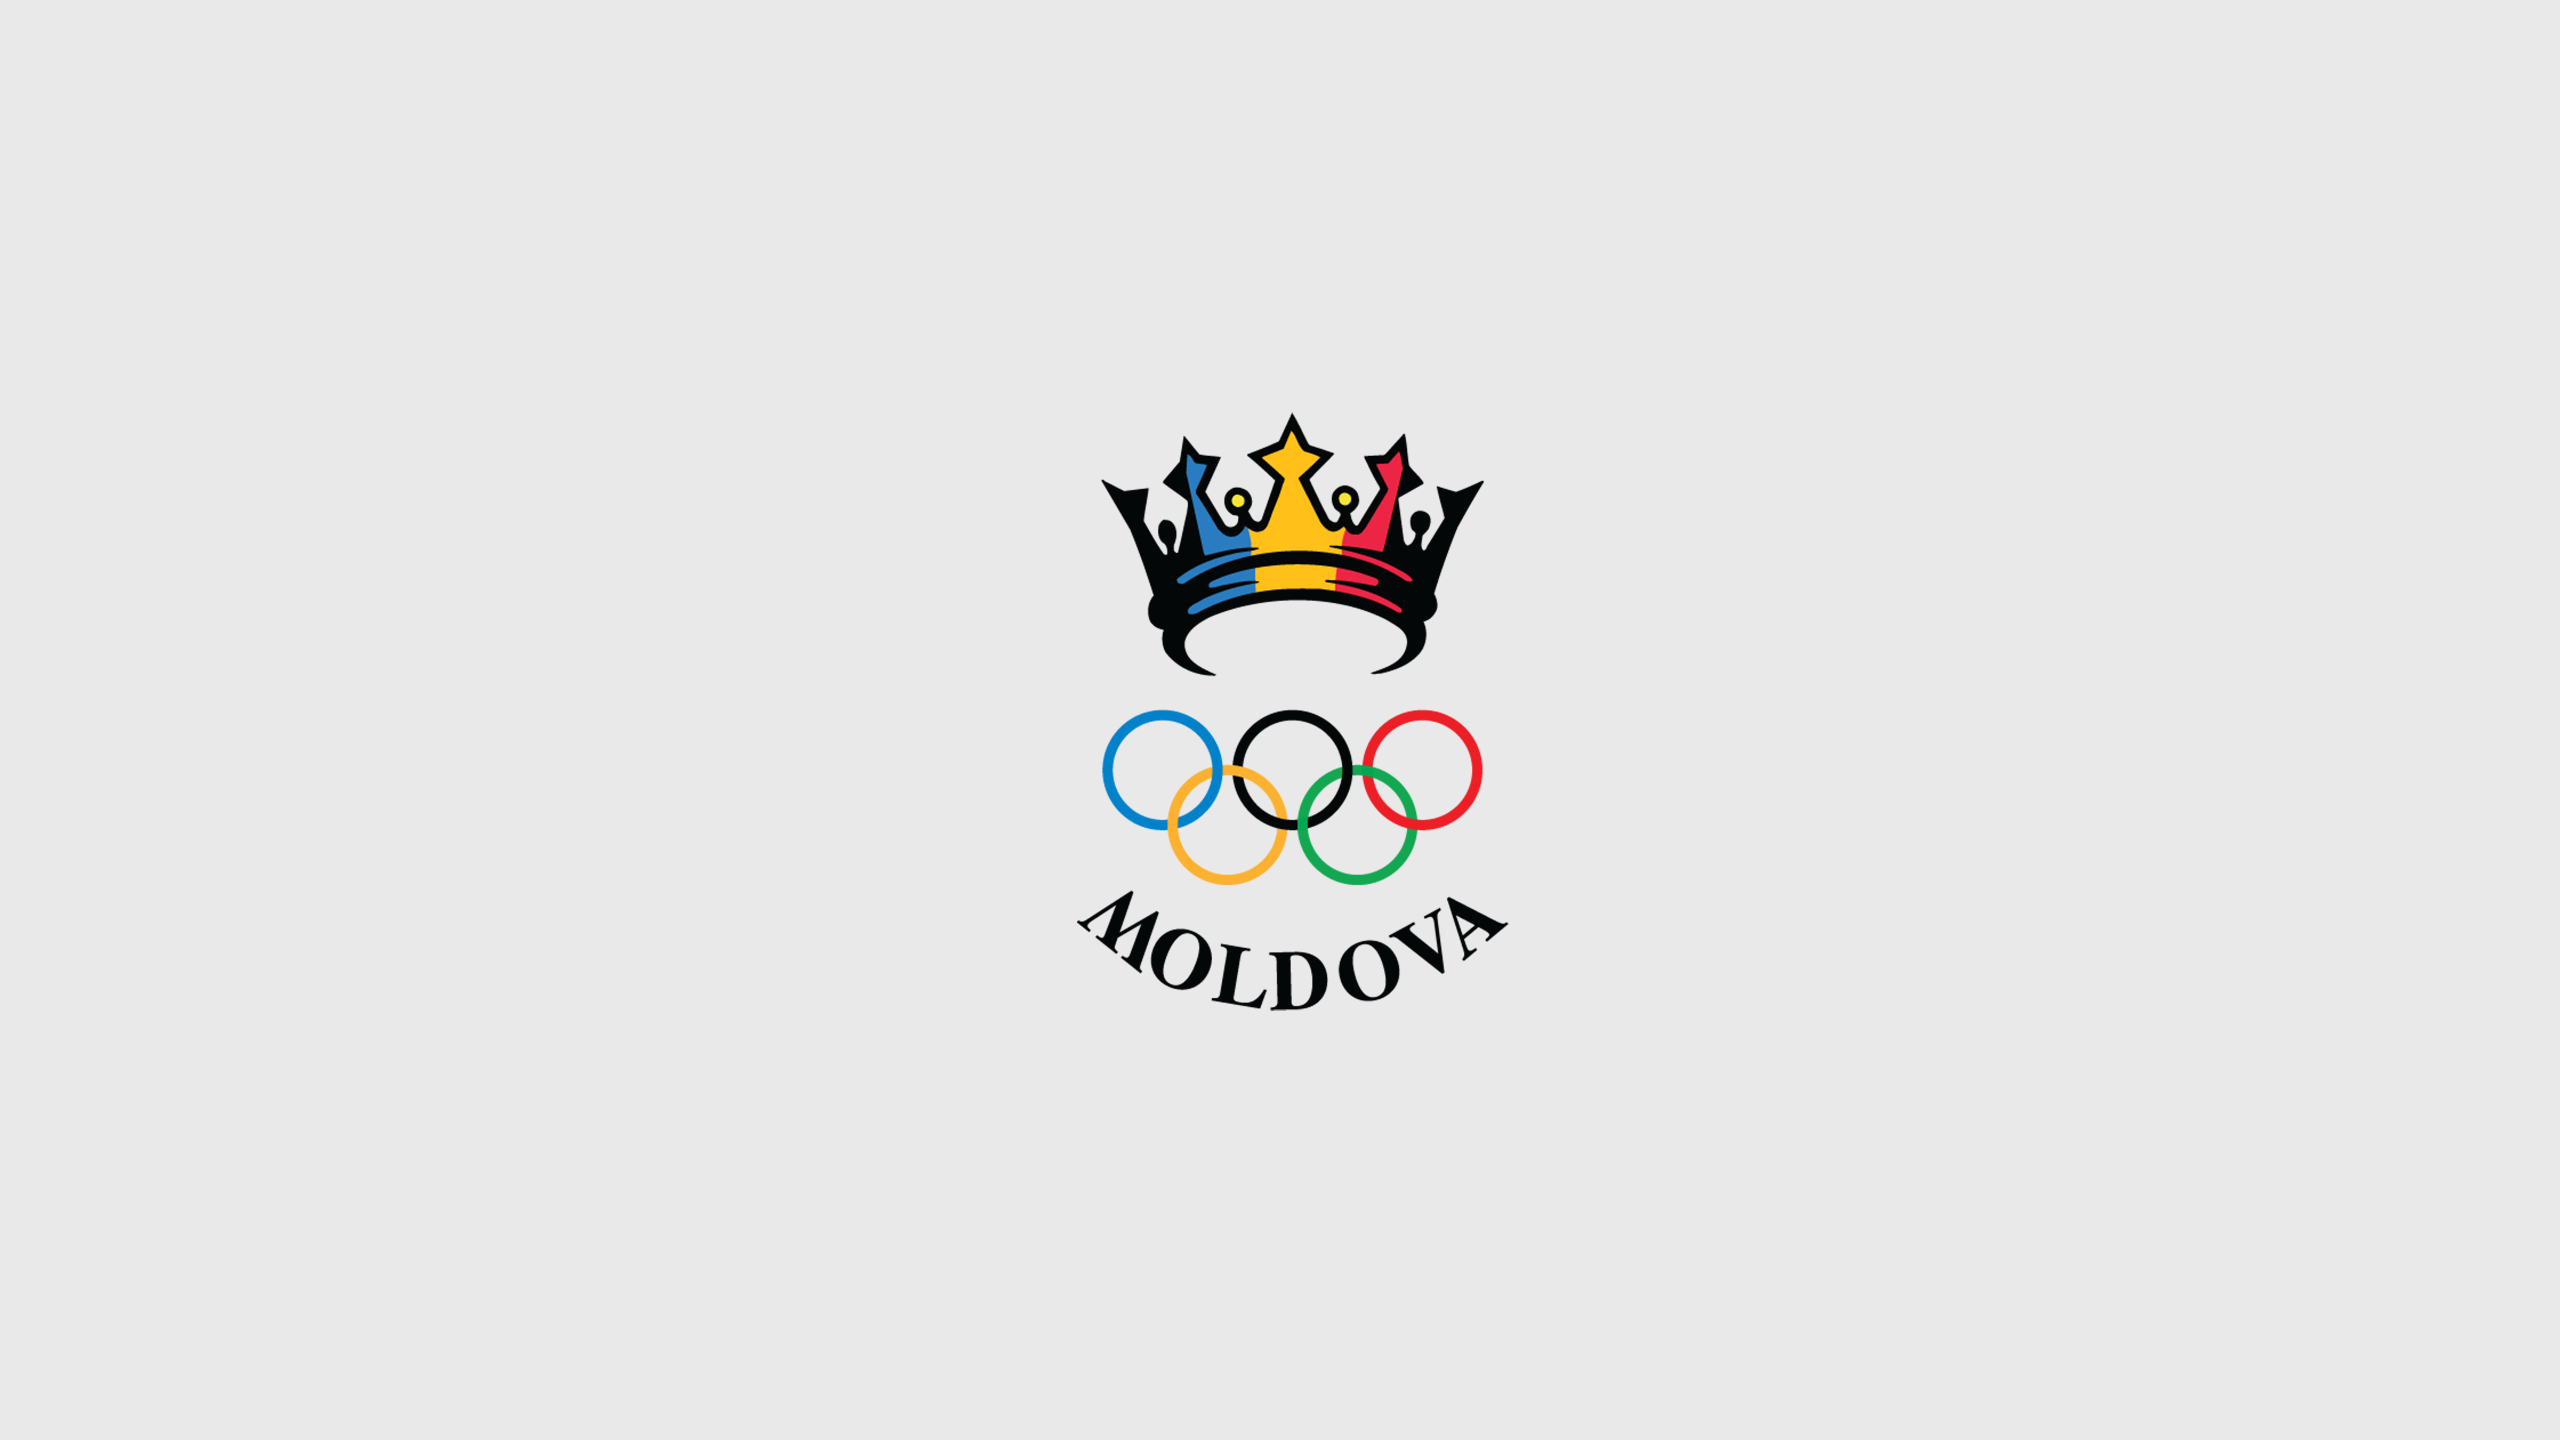 CNOS anunță Decizia Curții de Arbitraj Sportiv